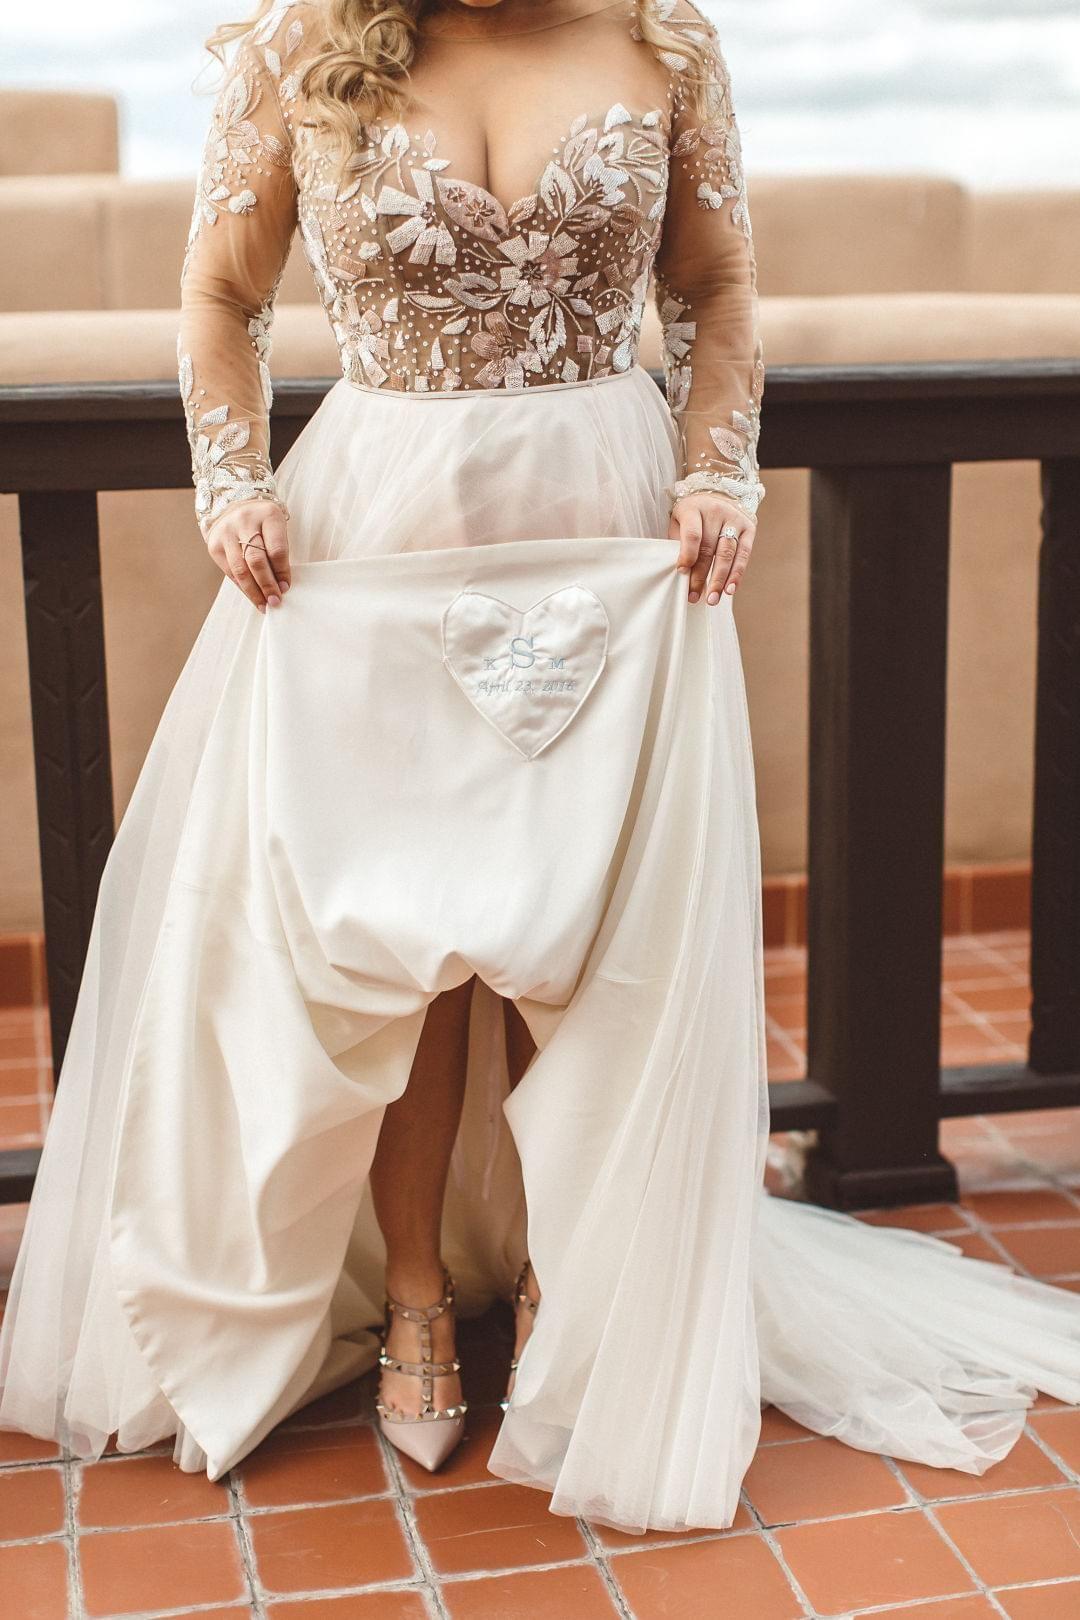 Charming Newest Beading Gorgeous Wedding Dress Long Sleeves Unique De Sposabridal Wedding Dresses Unique Gorgeous Wedding Dress Wedding Dress Long Sleeve